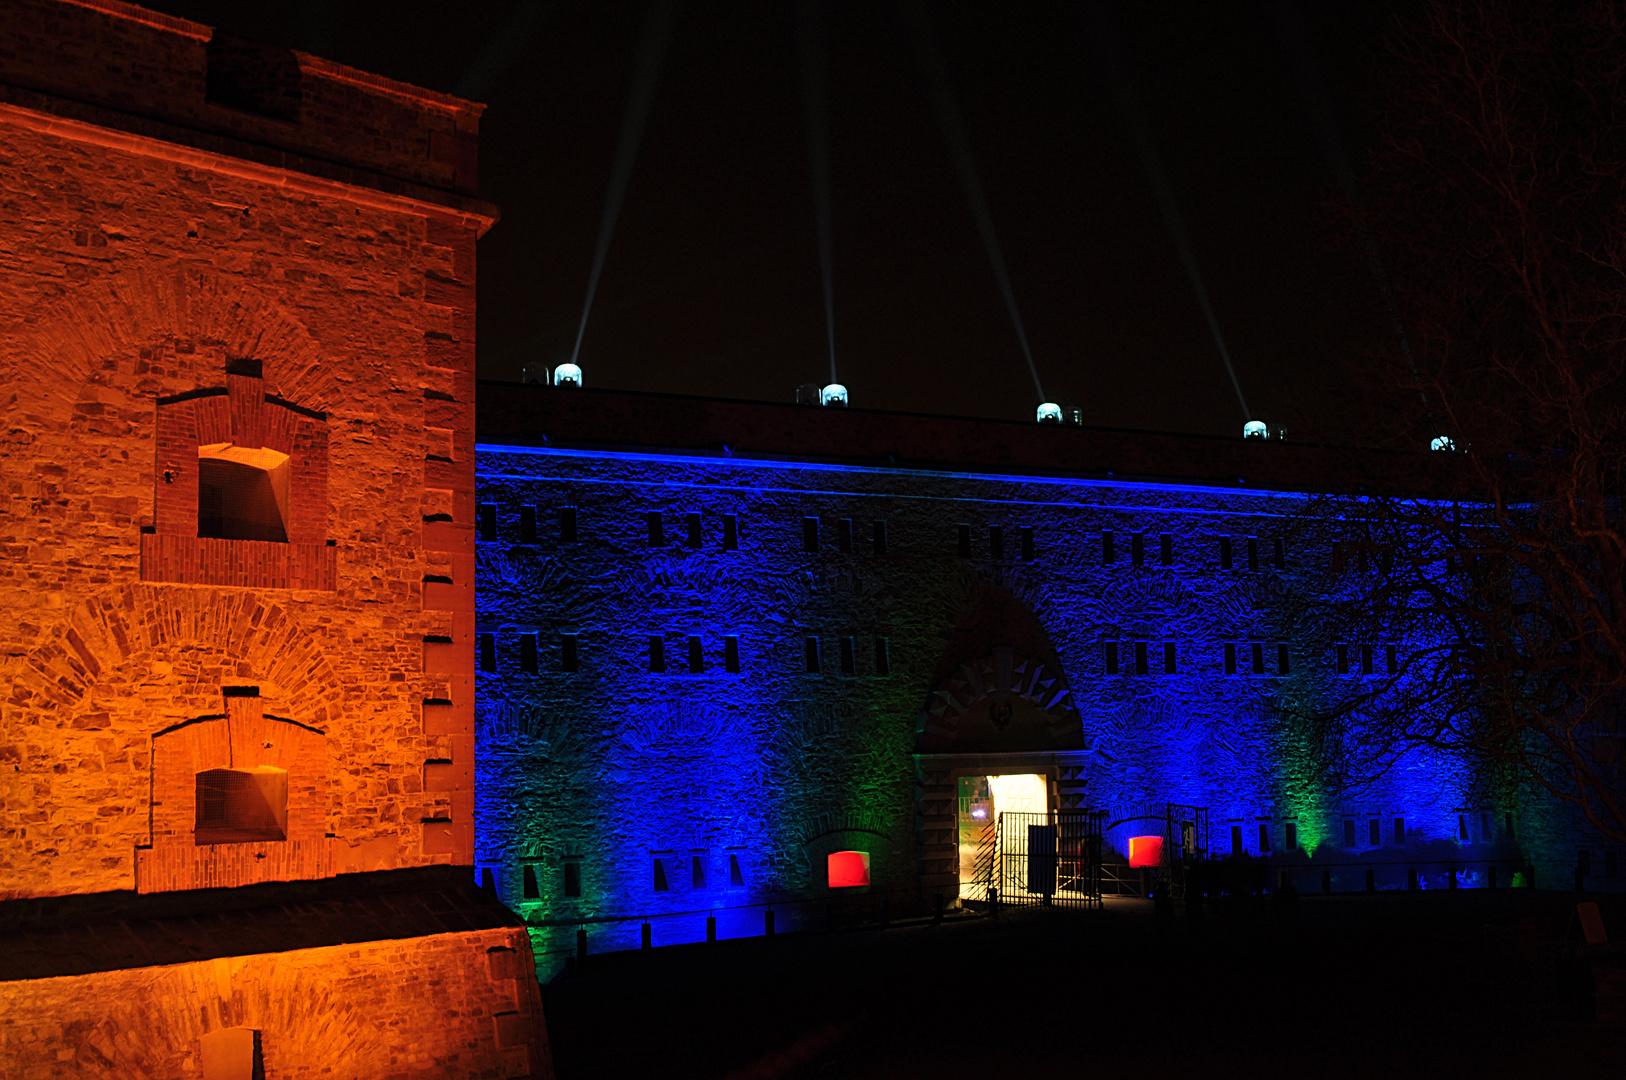 Festungsleuchten 2013 II